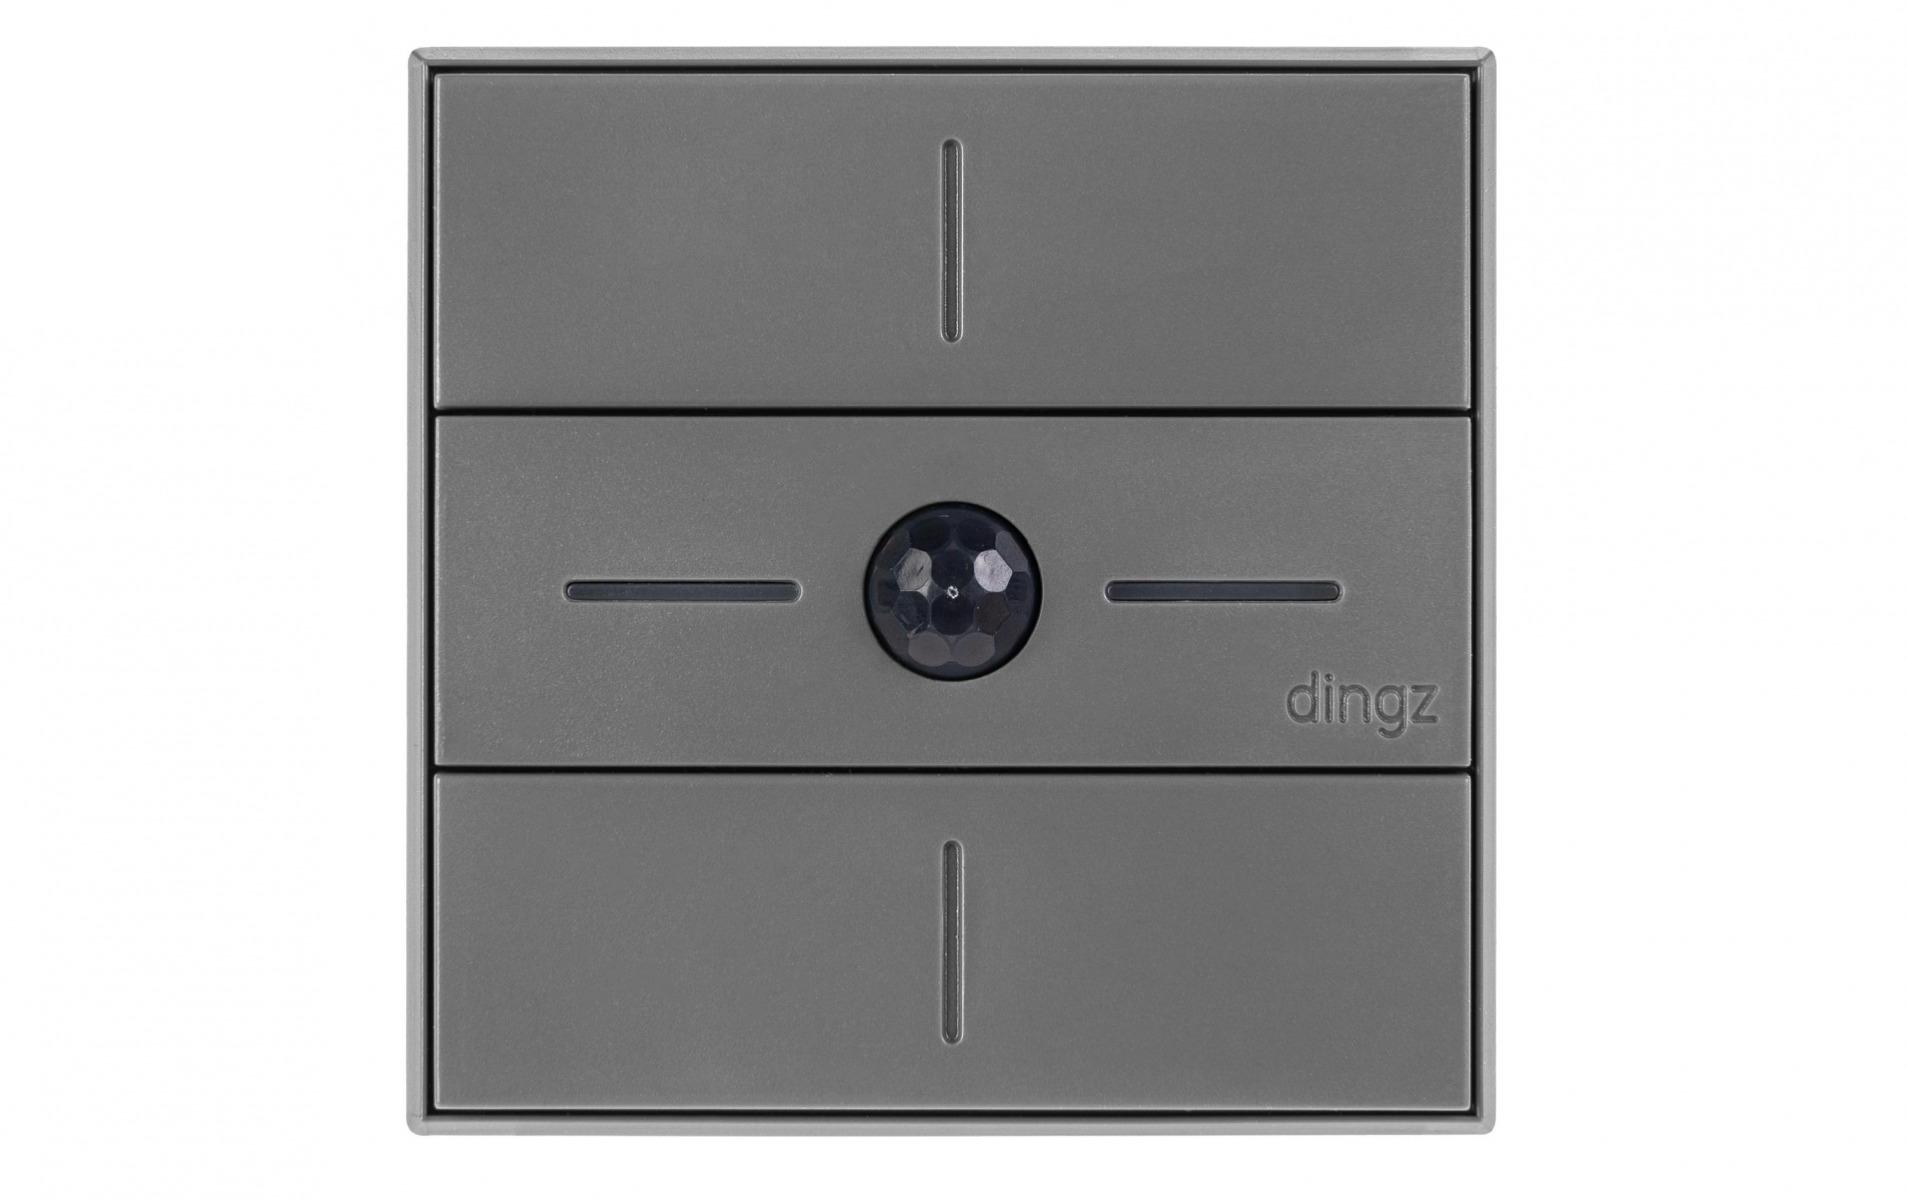 Image of dingz WLAN-Schalter «dingz plus» mit Bewegungsmelder UP dunkelgrau